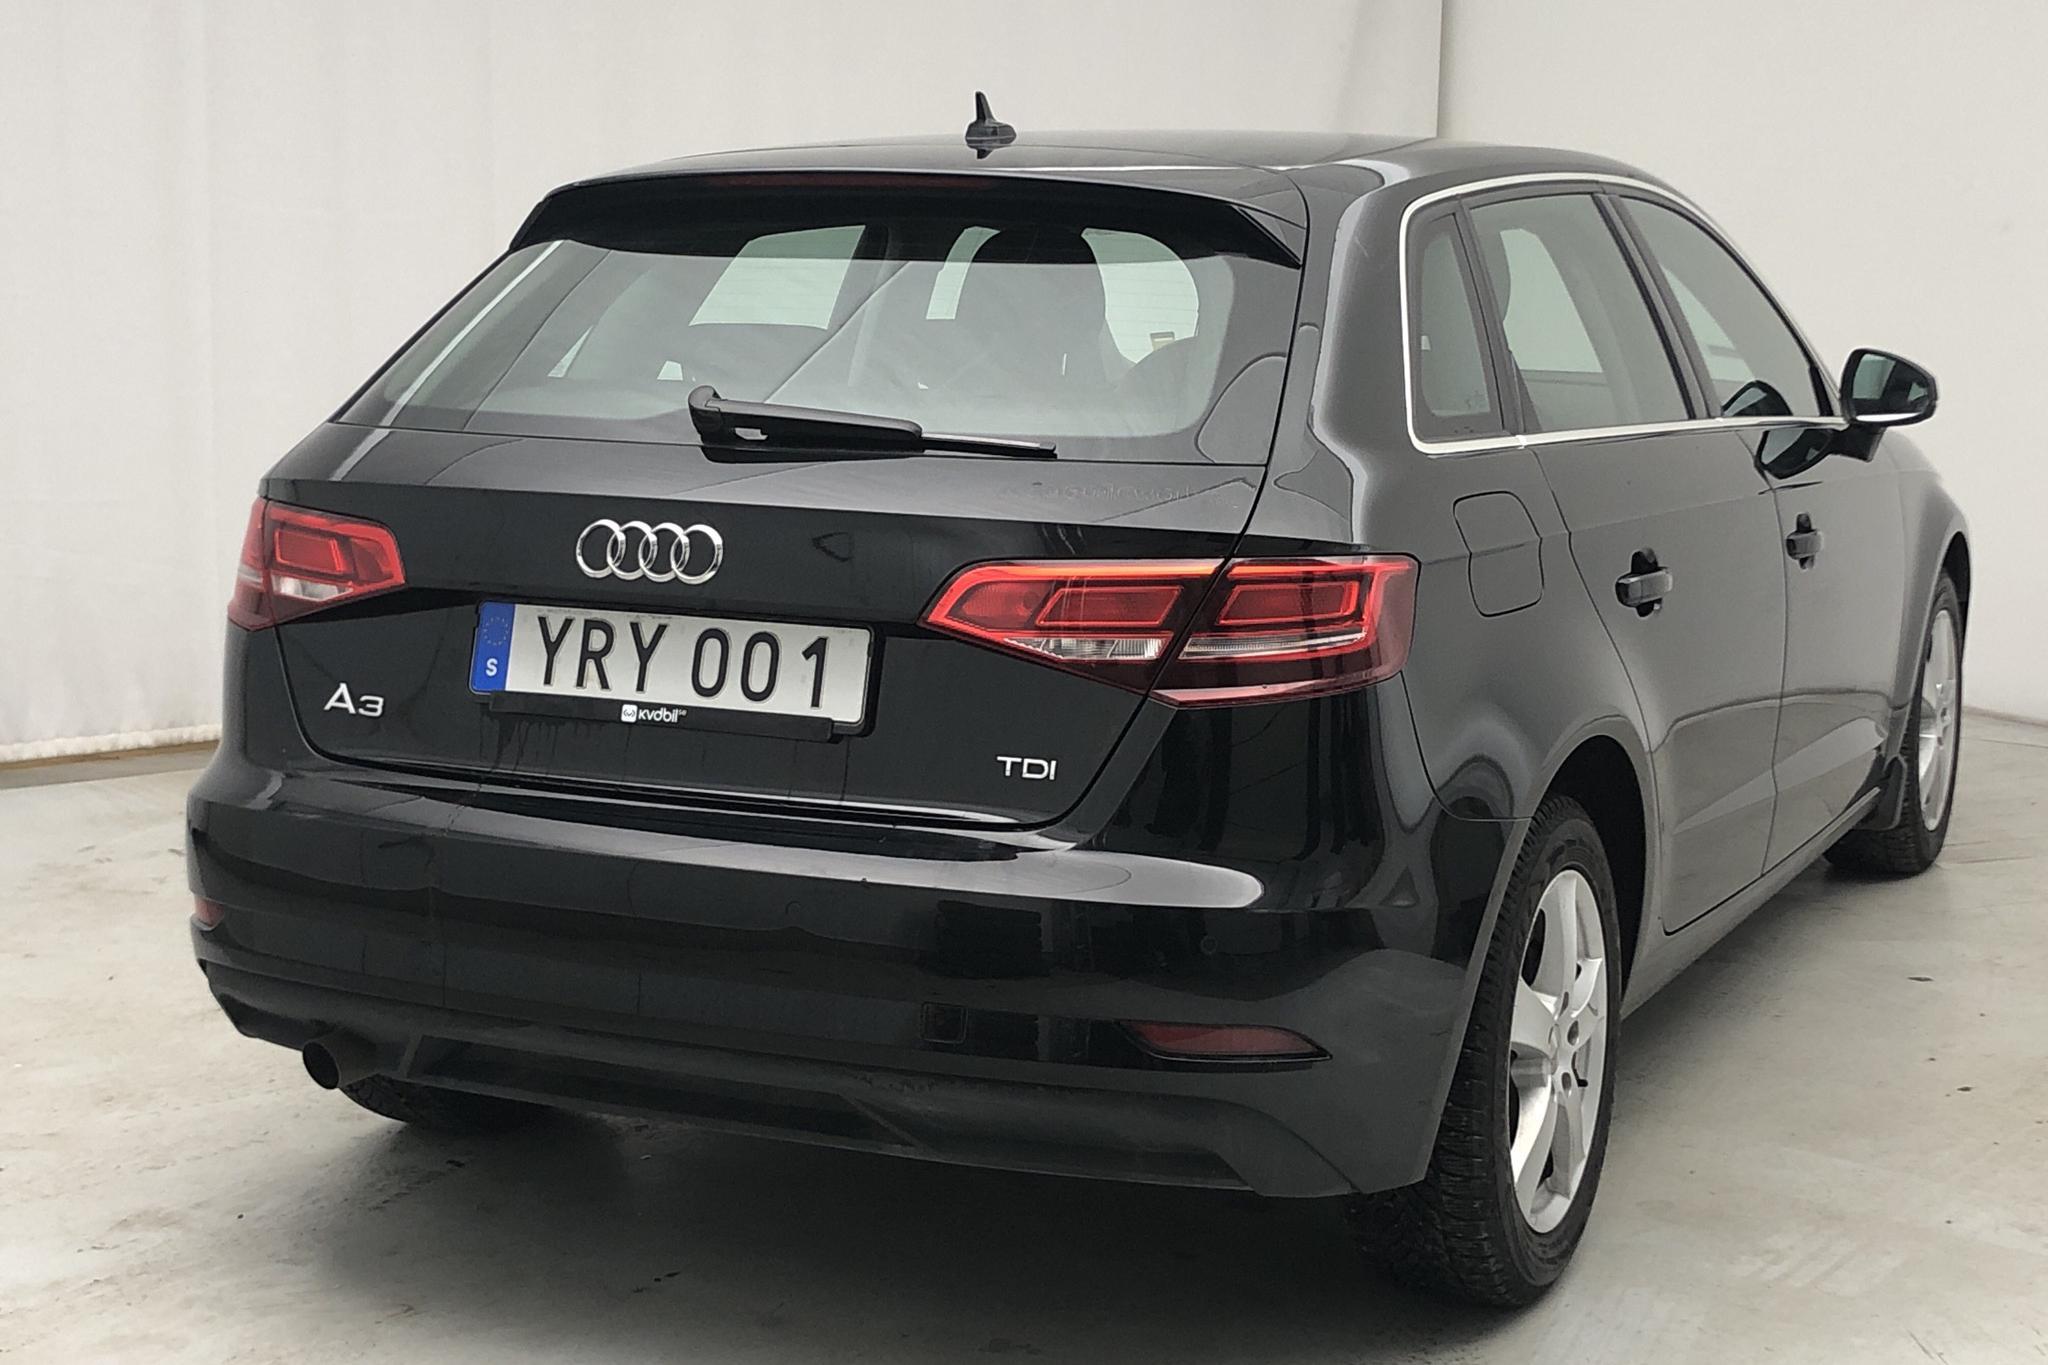 Audi A3 1.6 TDI Sportback (116hk) - 32 960 km - Automatic - black - 2018